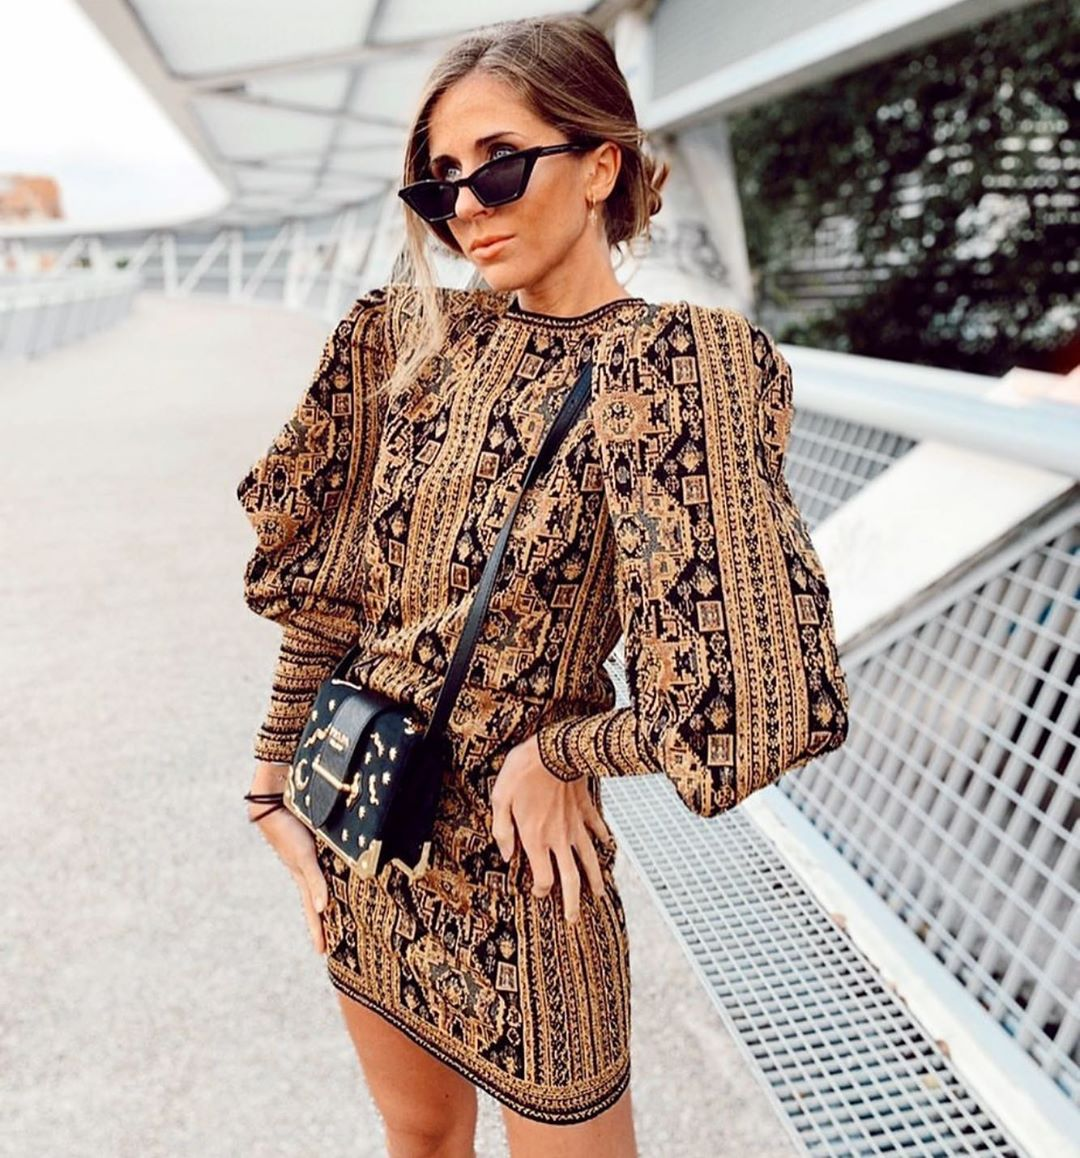 jacquard dress de Zara sur zaraaddiction